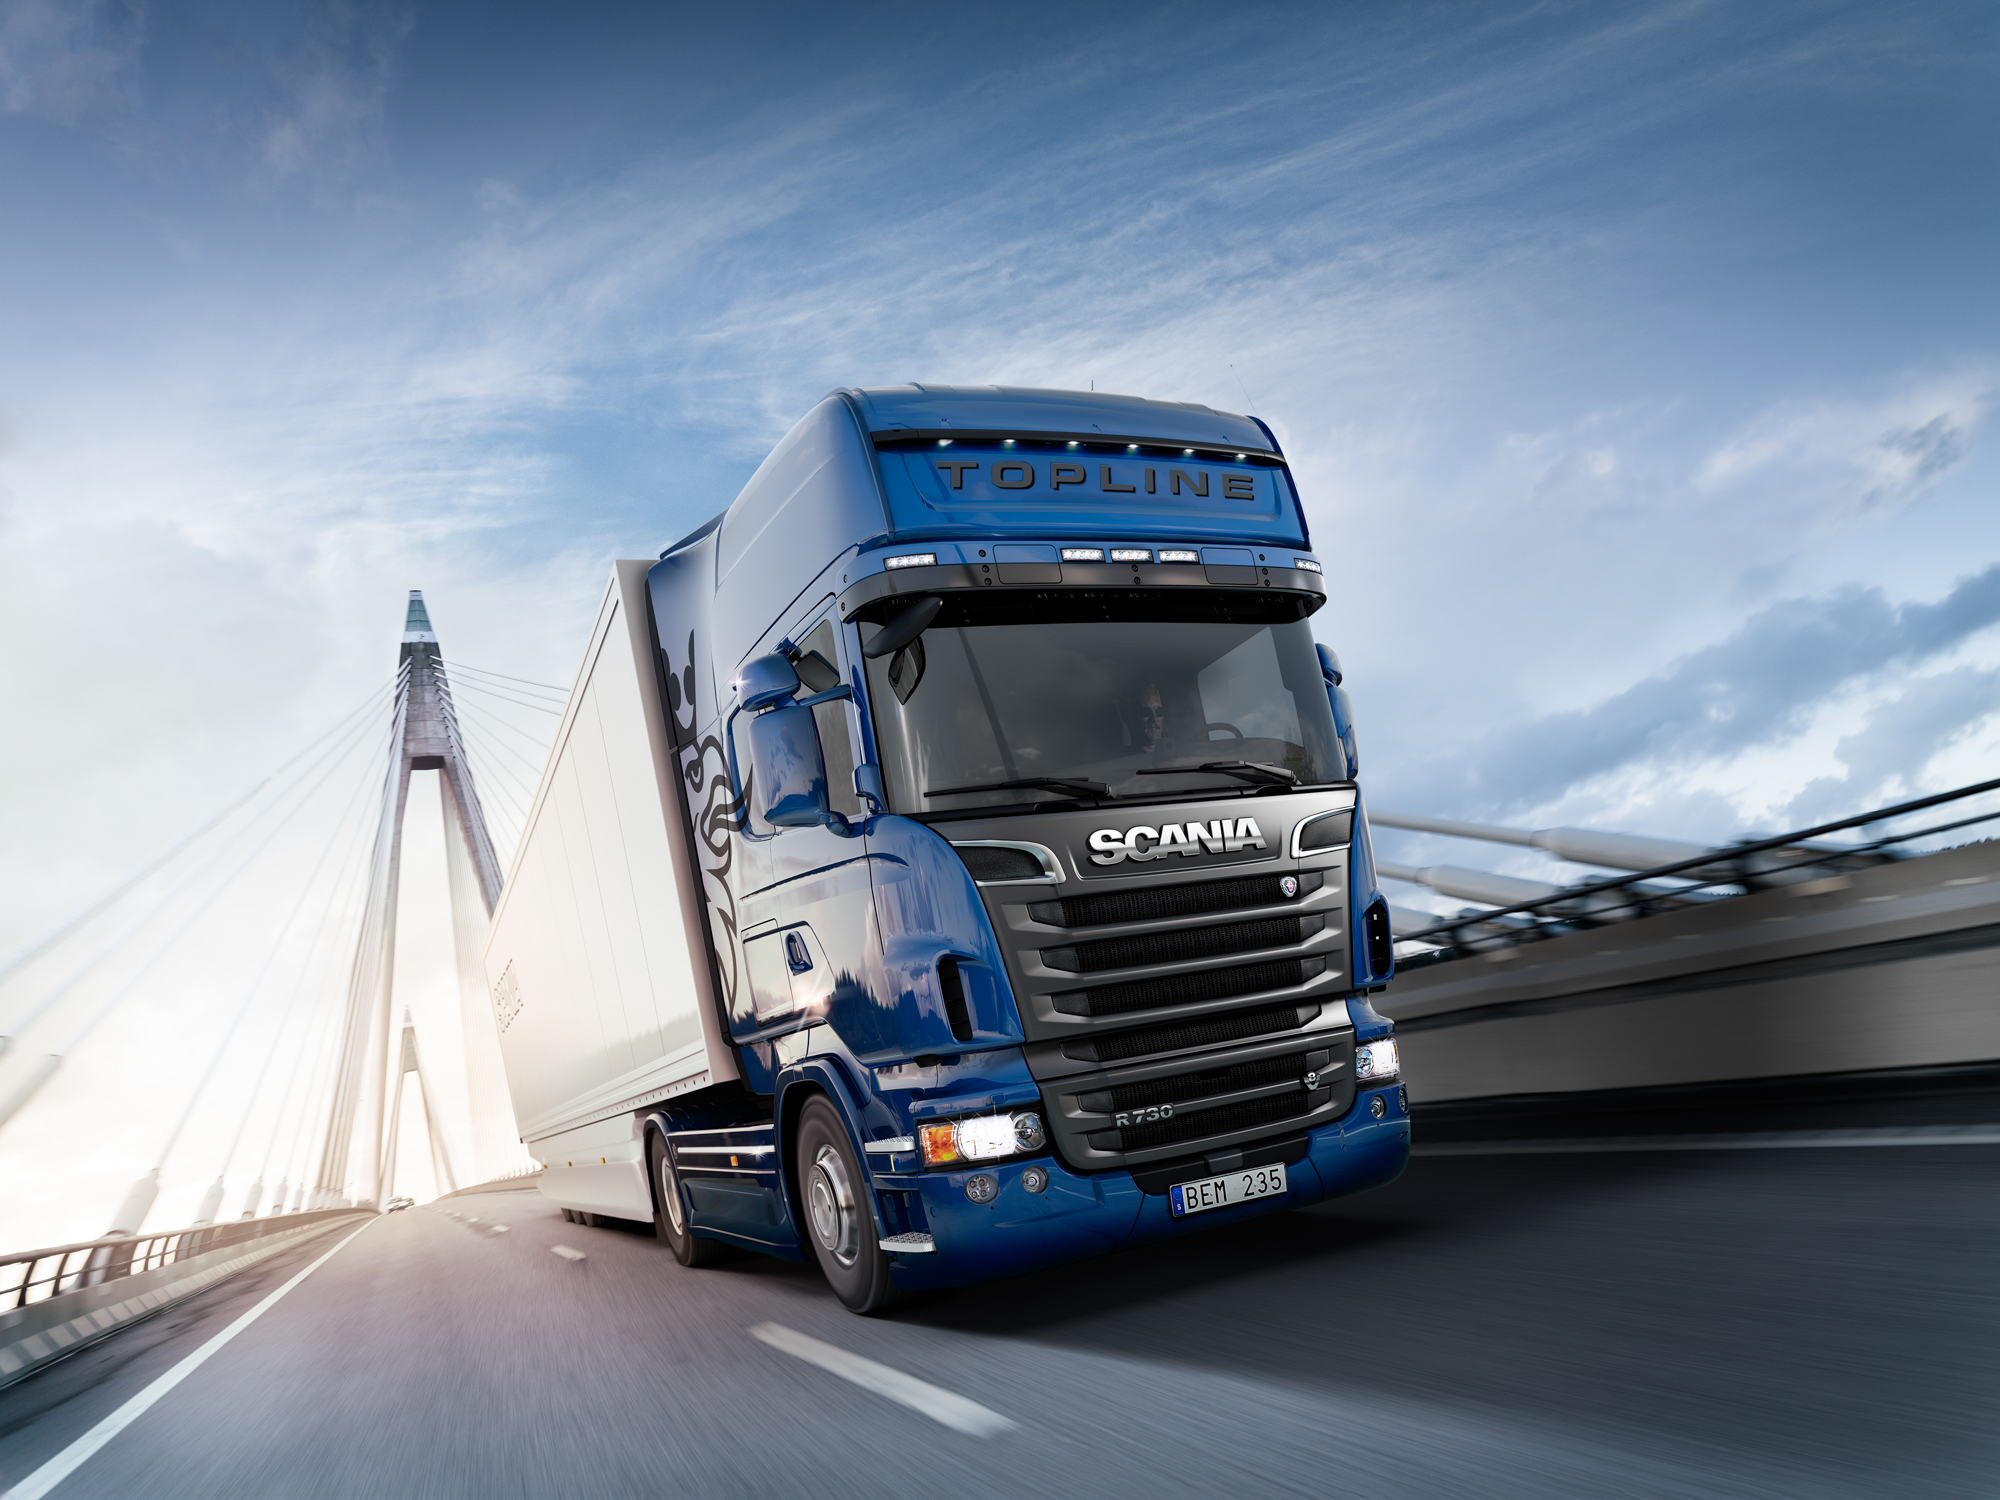 Scania_Truck_Bridge.JPG